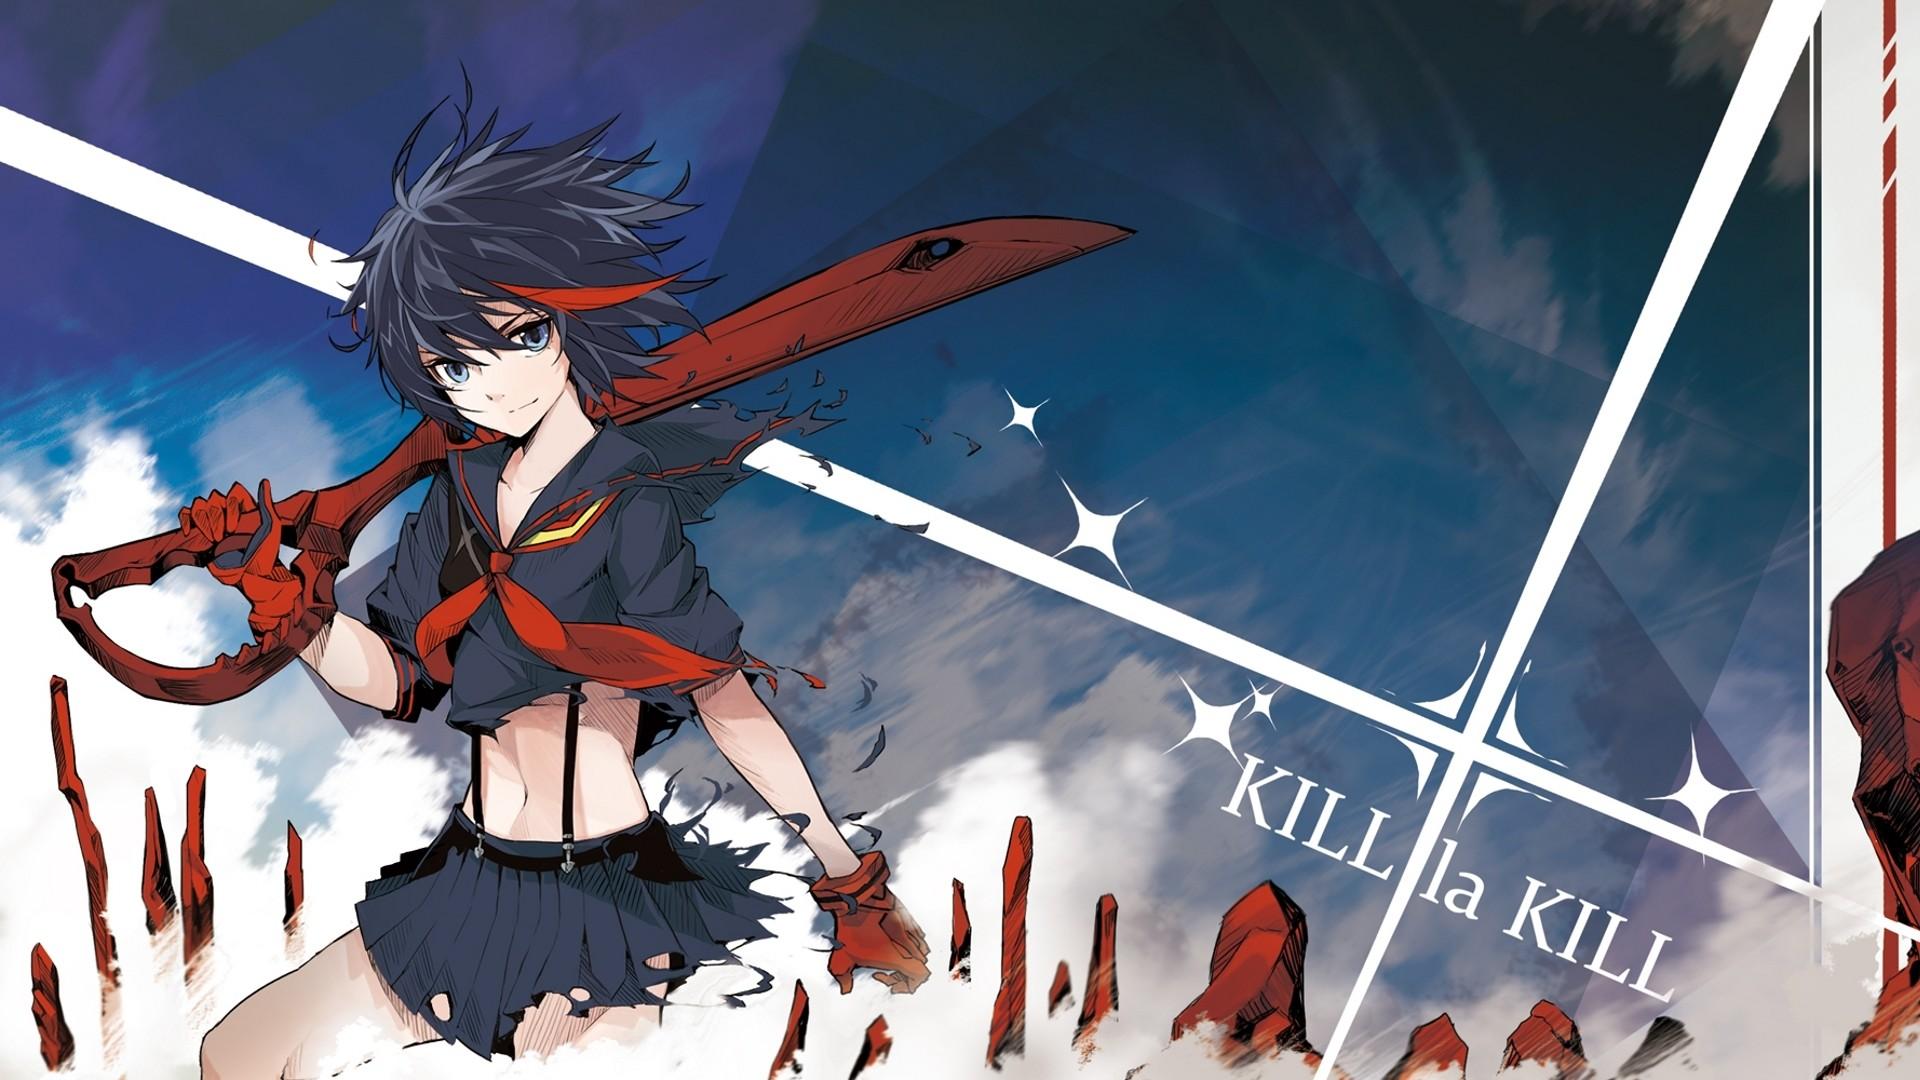 Kill La Kill Wallpaper 1366x768 62 images 1920x1080